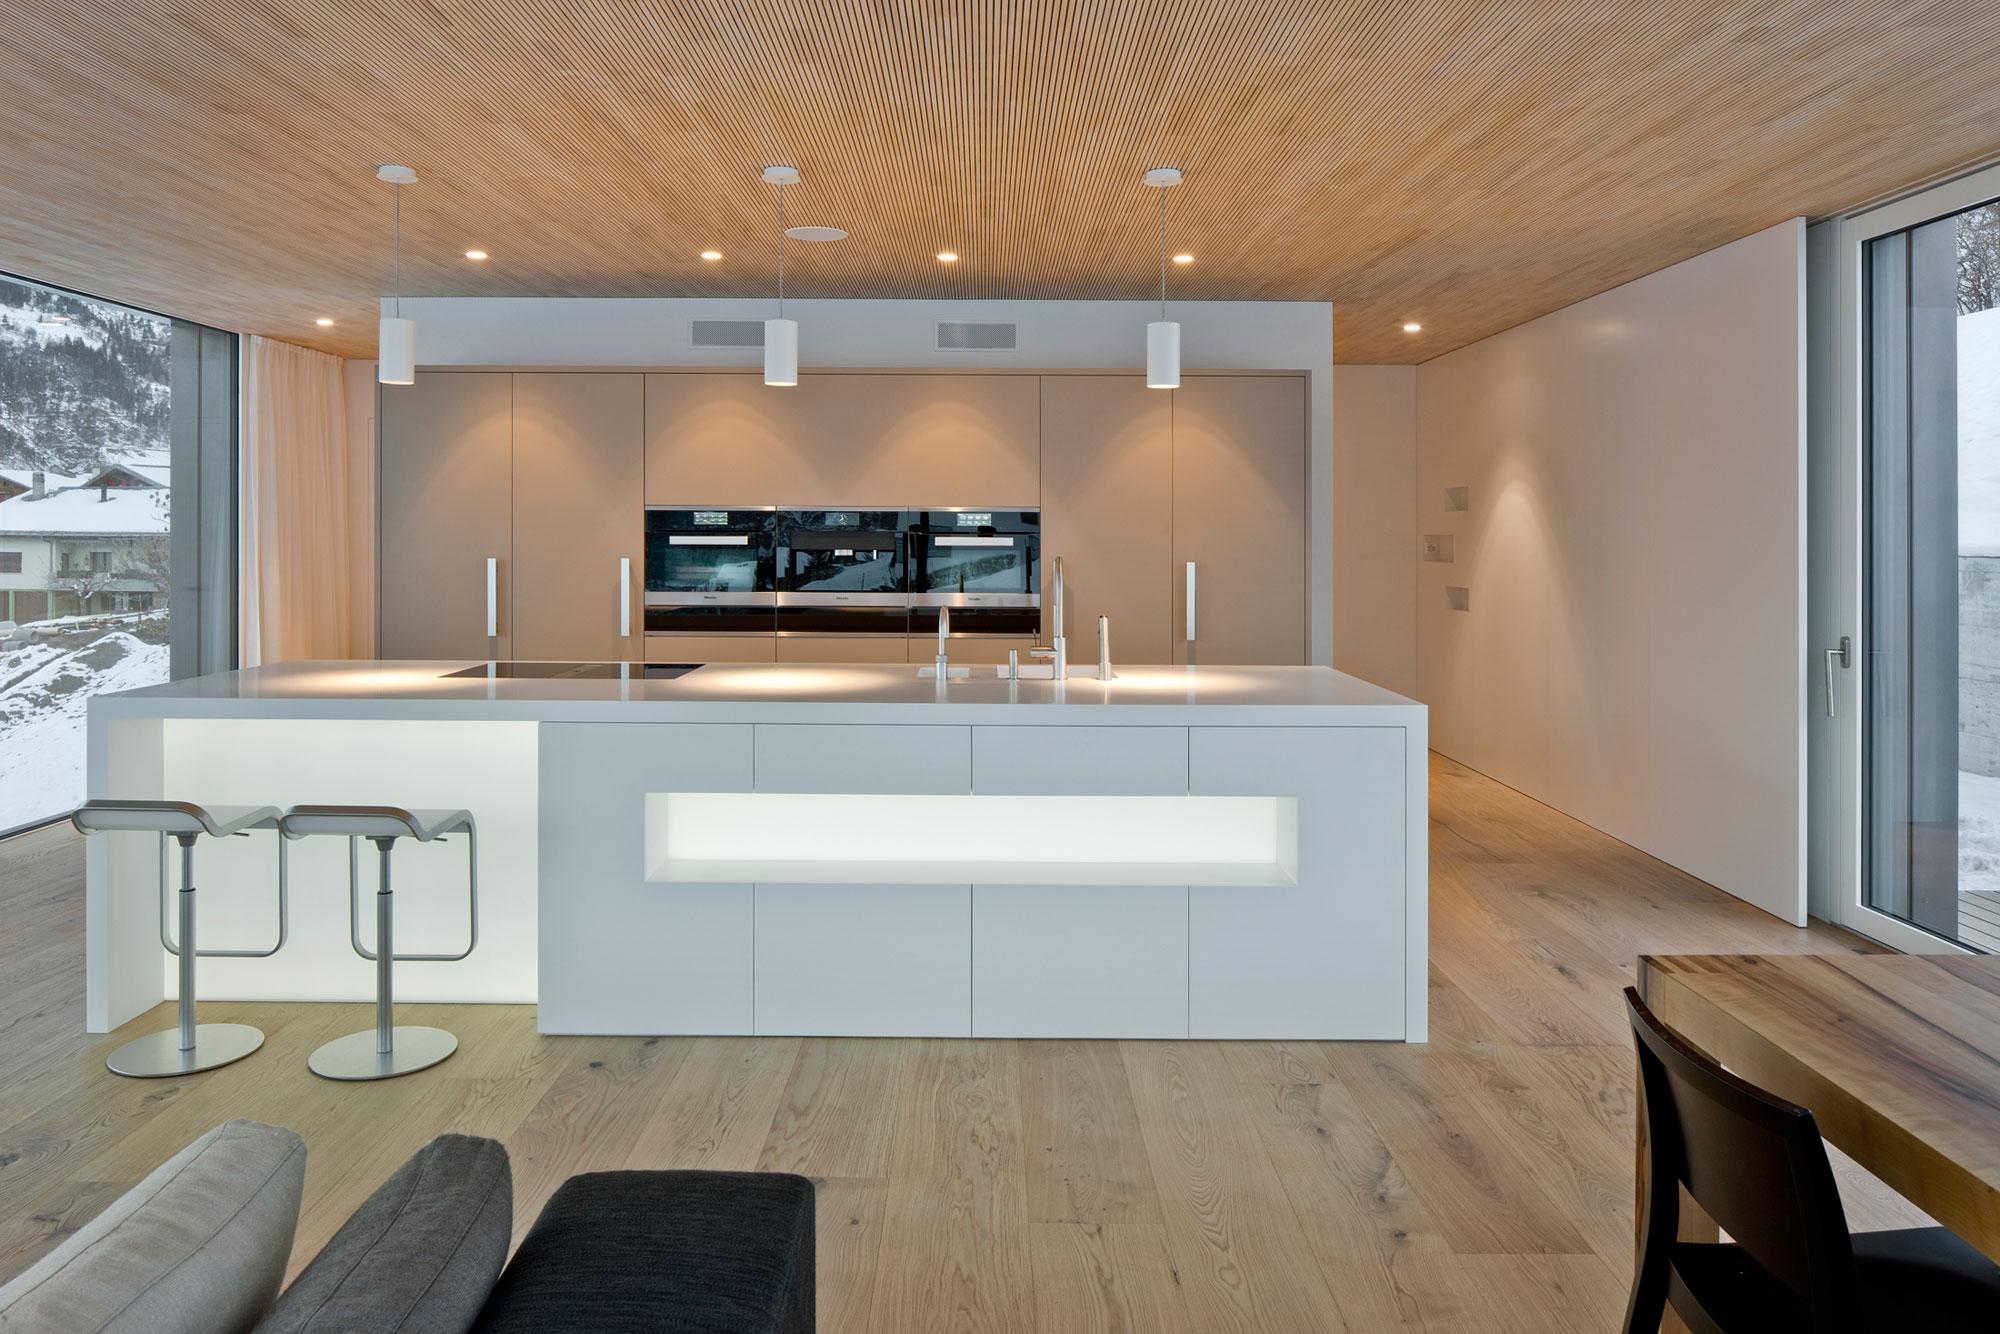 A HI-MACS House In Termen by Zeiter Berchtold-04